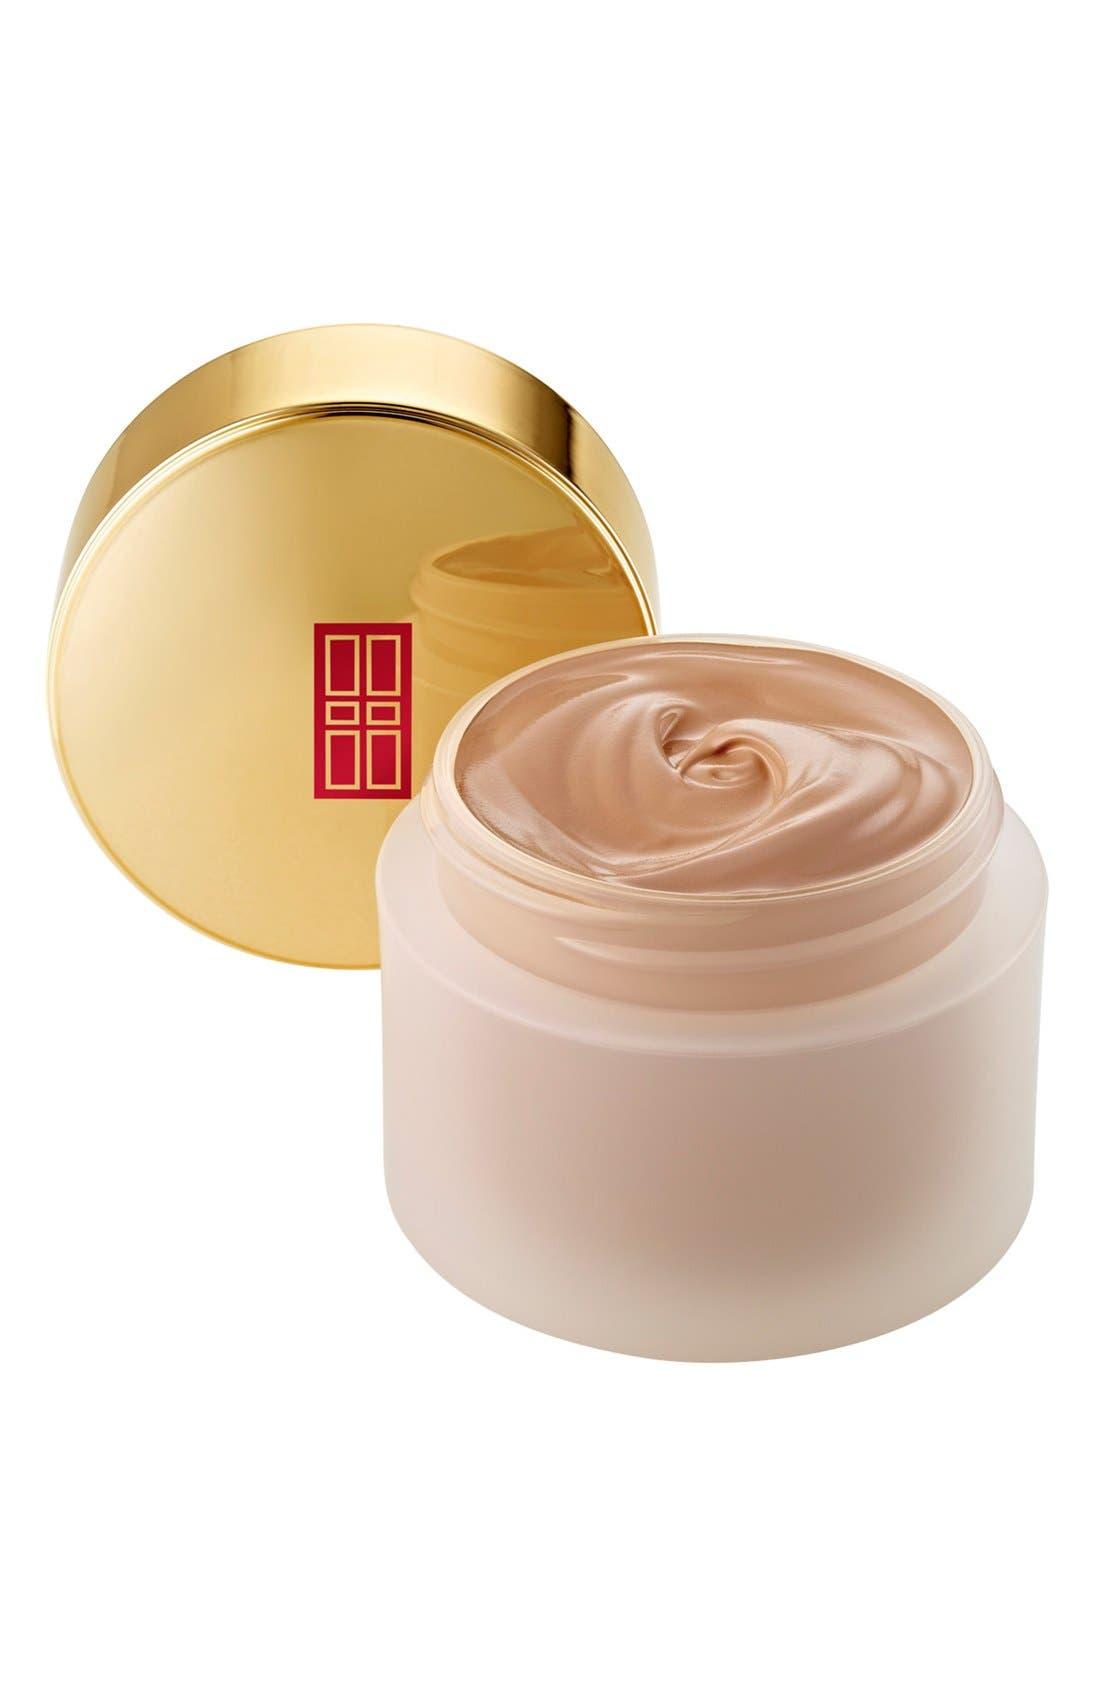 Elizabeth Arden Ceramide Lift & Firm Makeup Broad Spectrum SPF 15